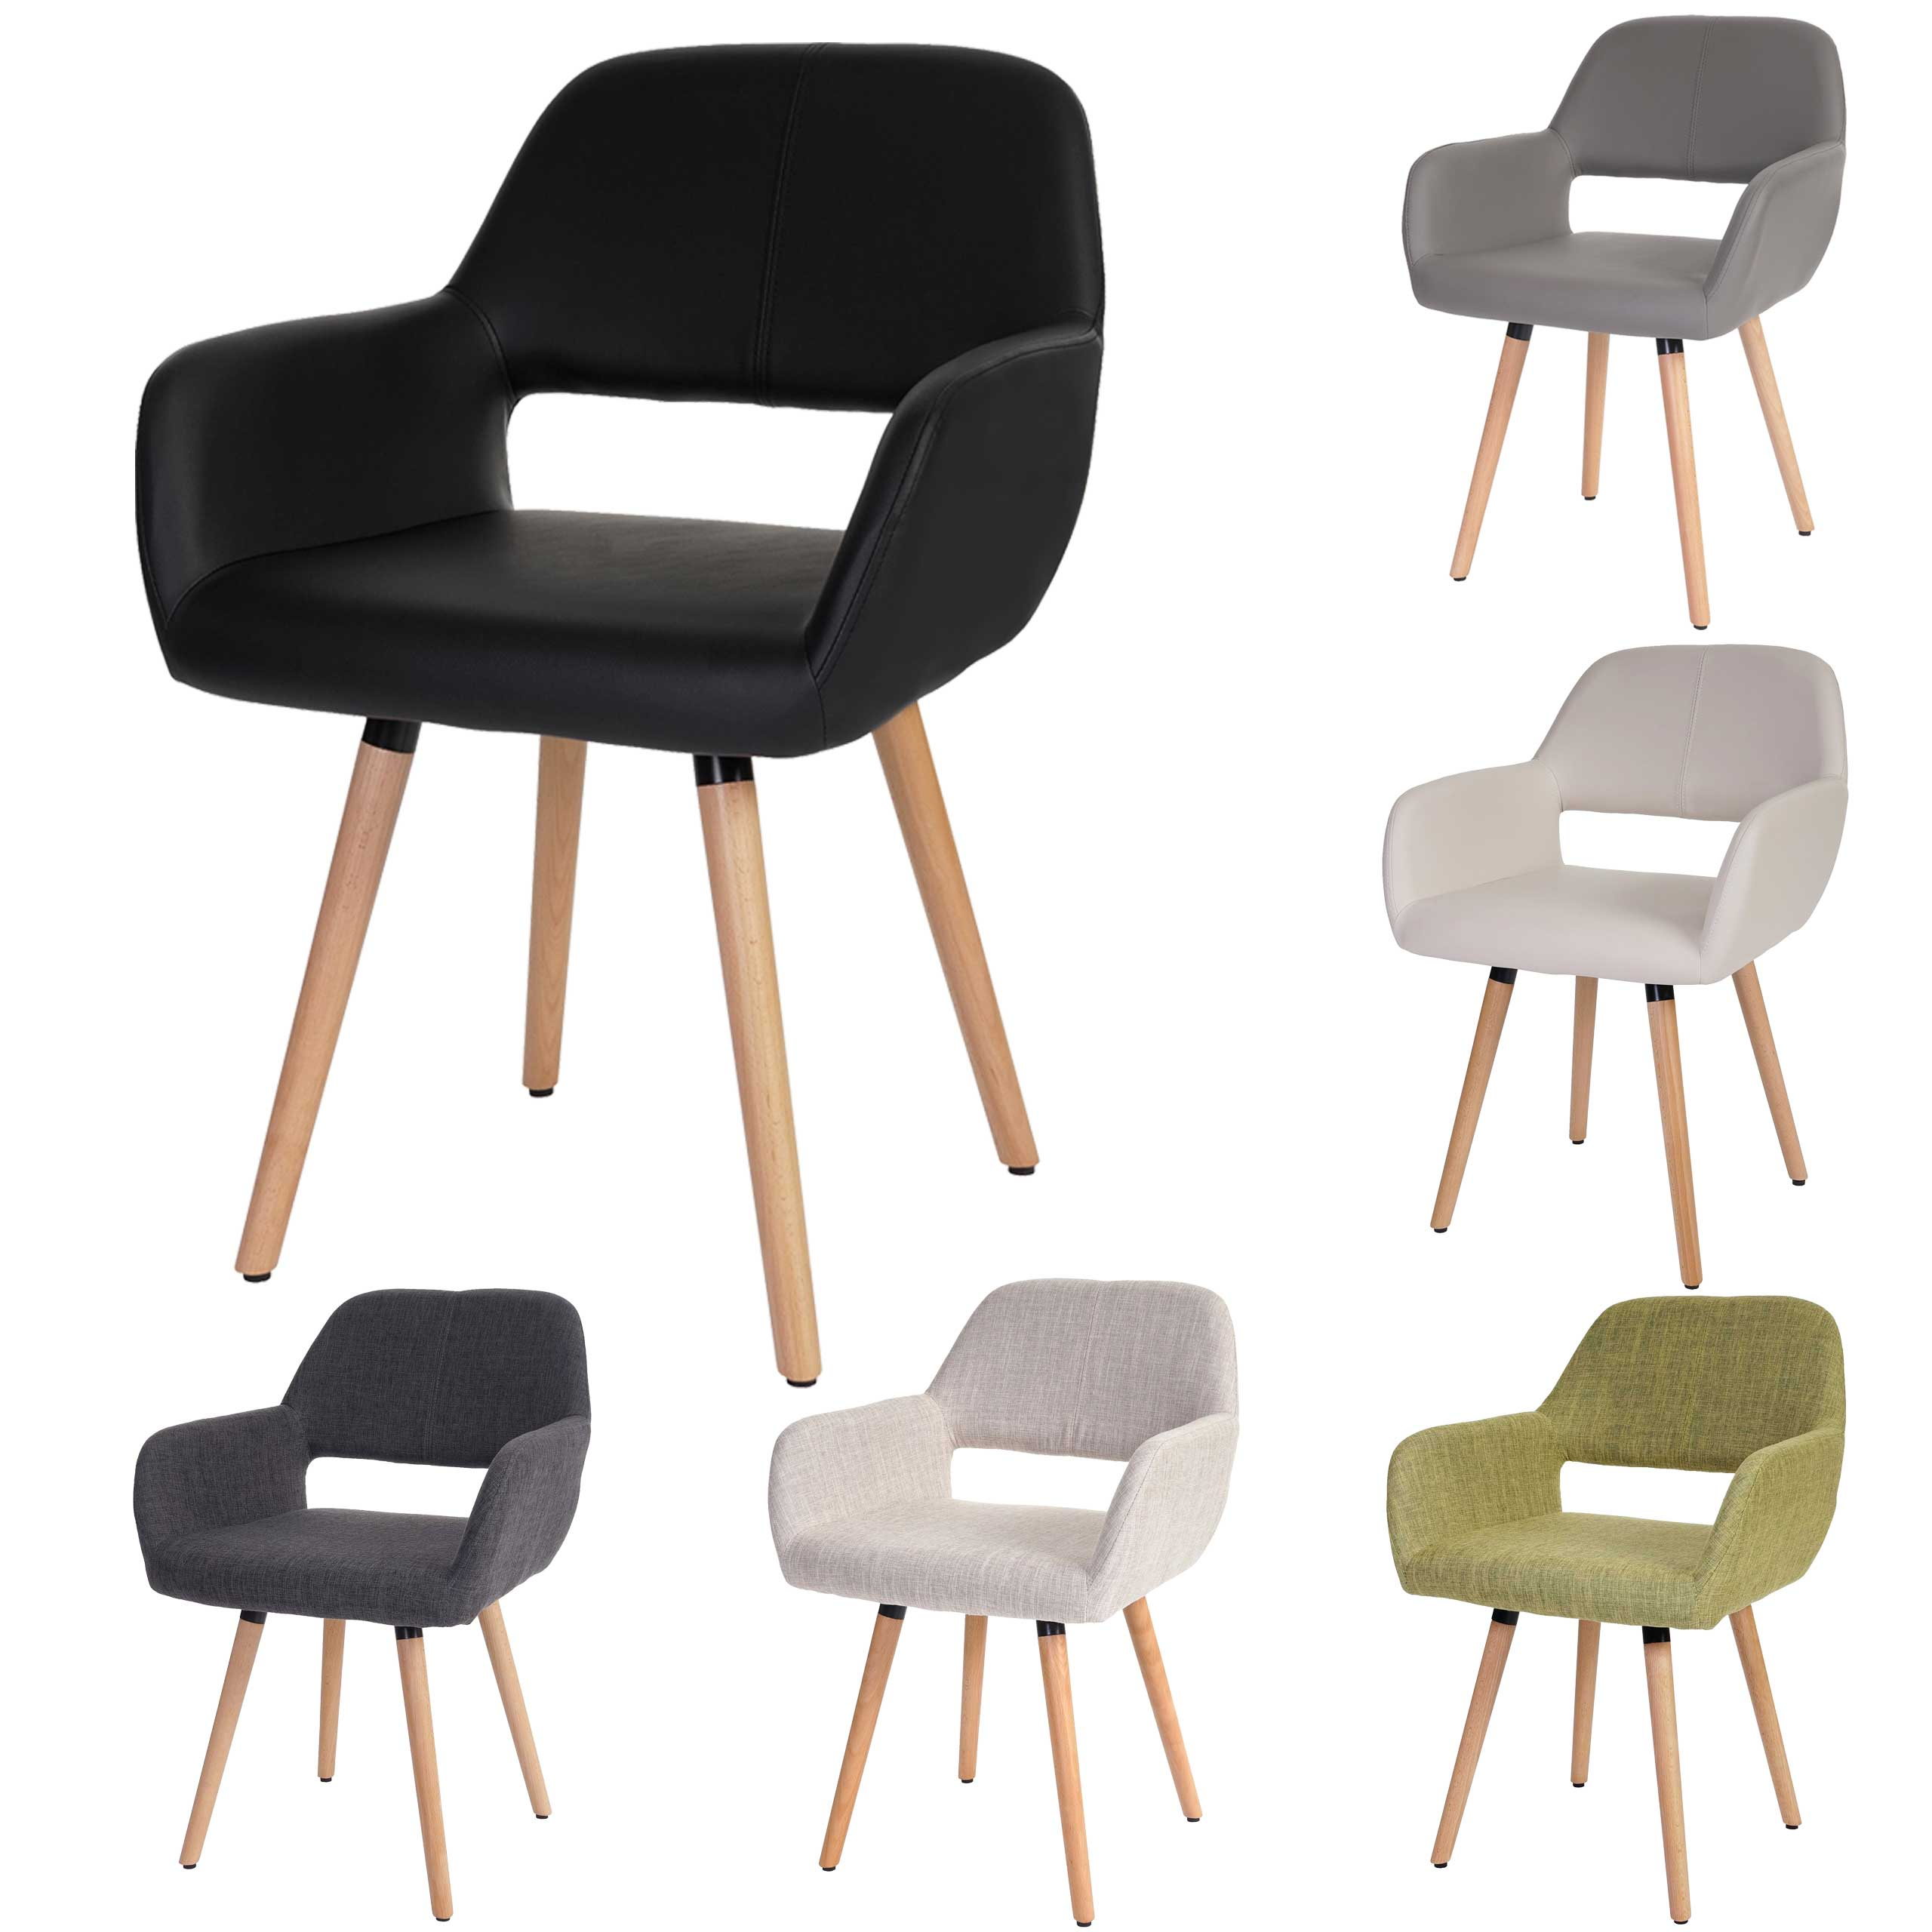 Mendler Esszimmerstuhl HWC-A50 II, Stuhl Küchenstuhl, Retro 50er Jahre Design ~ Variantenangebot 48432